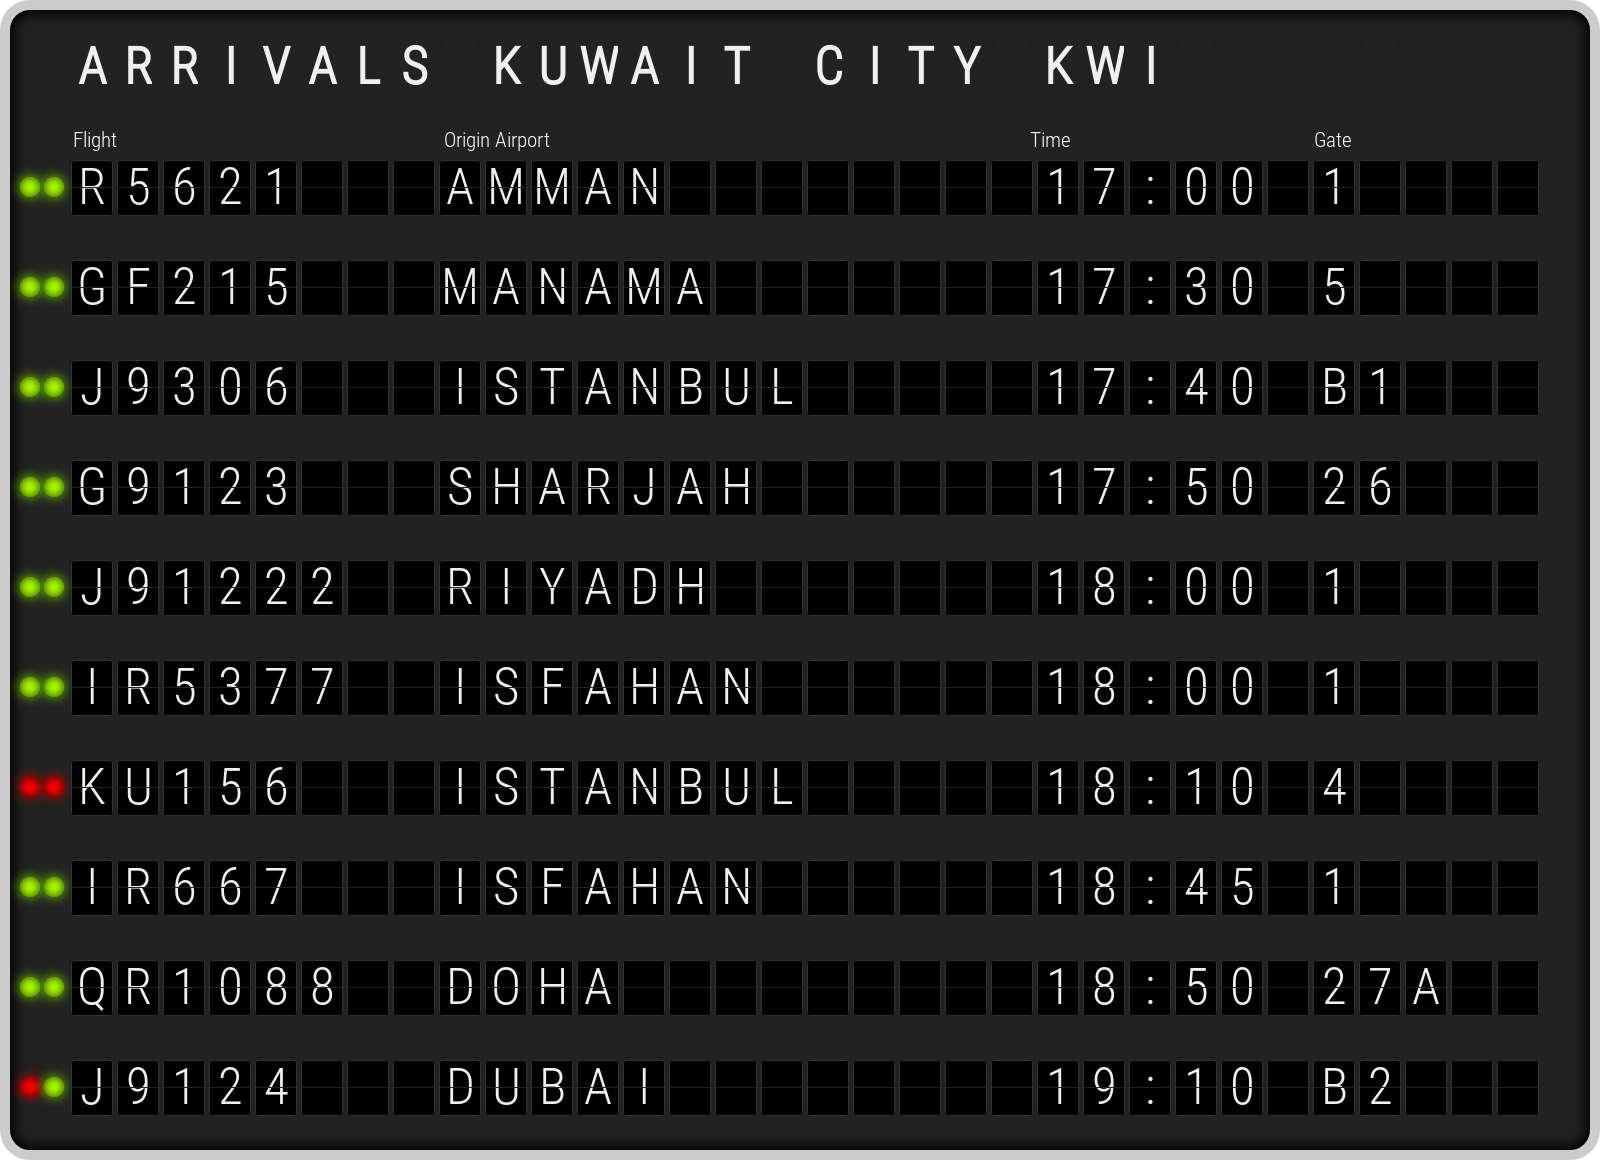 Kuwait airport arrivals board